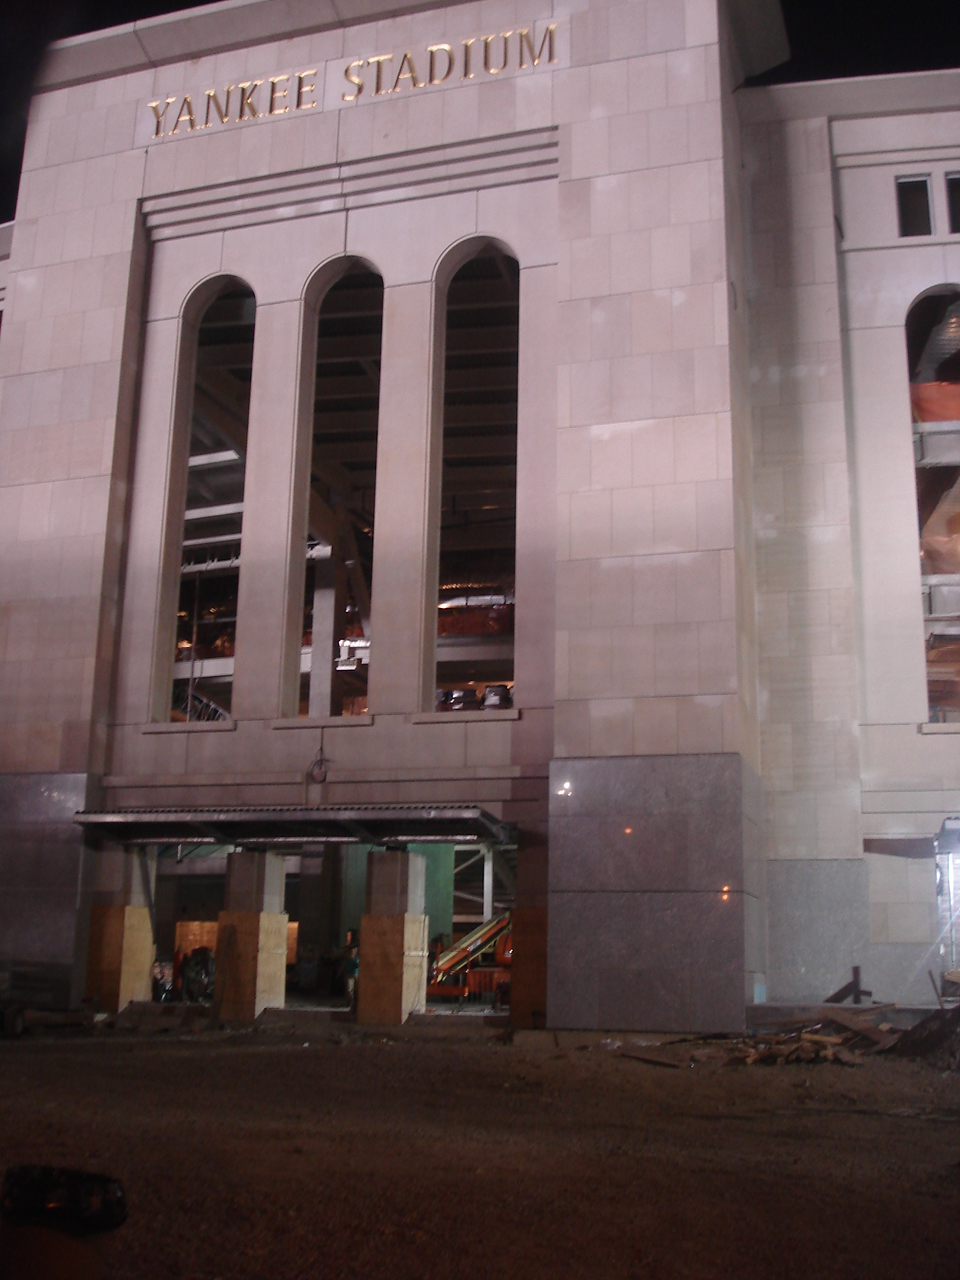 Nuevo Yankee Stadium (2009) - Página 3 2703163016_b86dfc4258_o